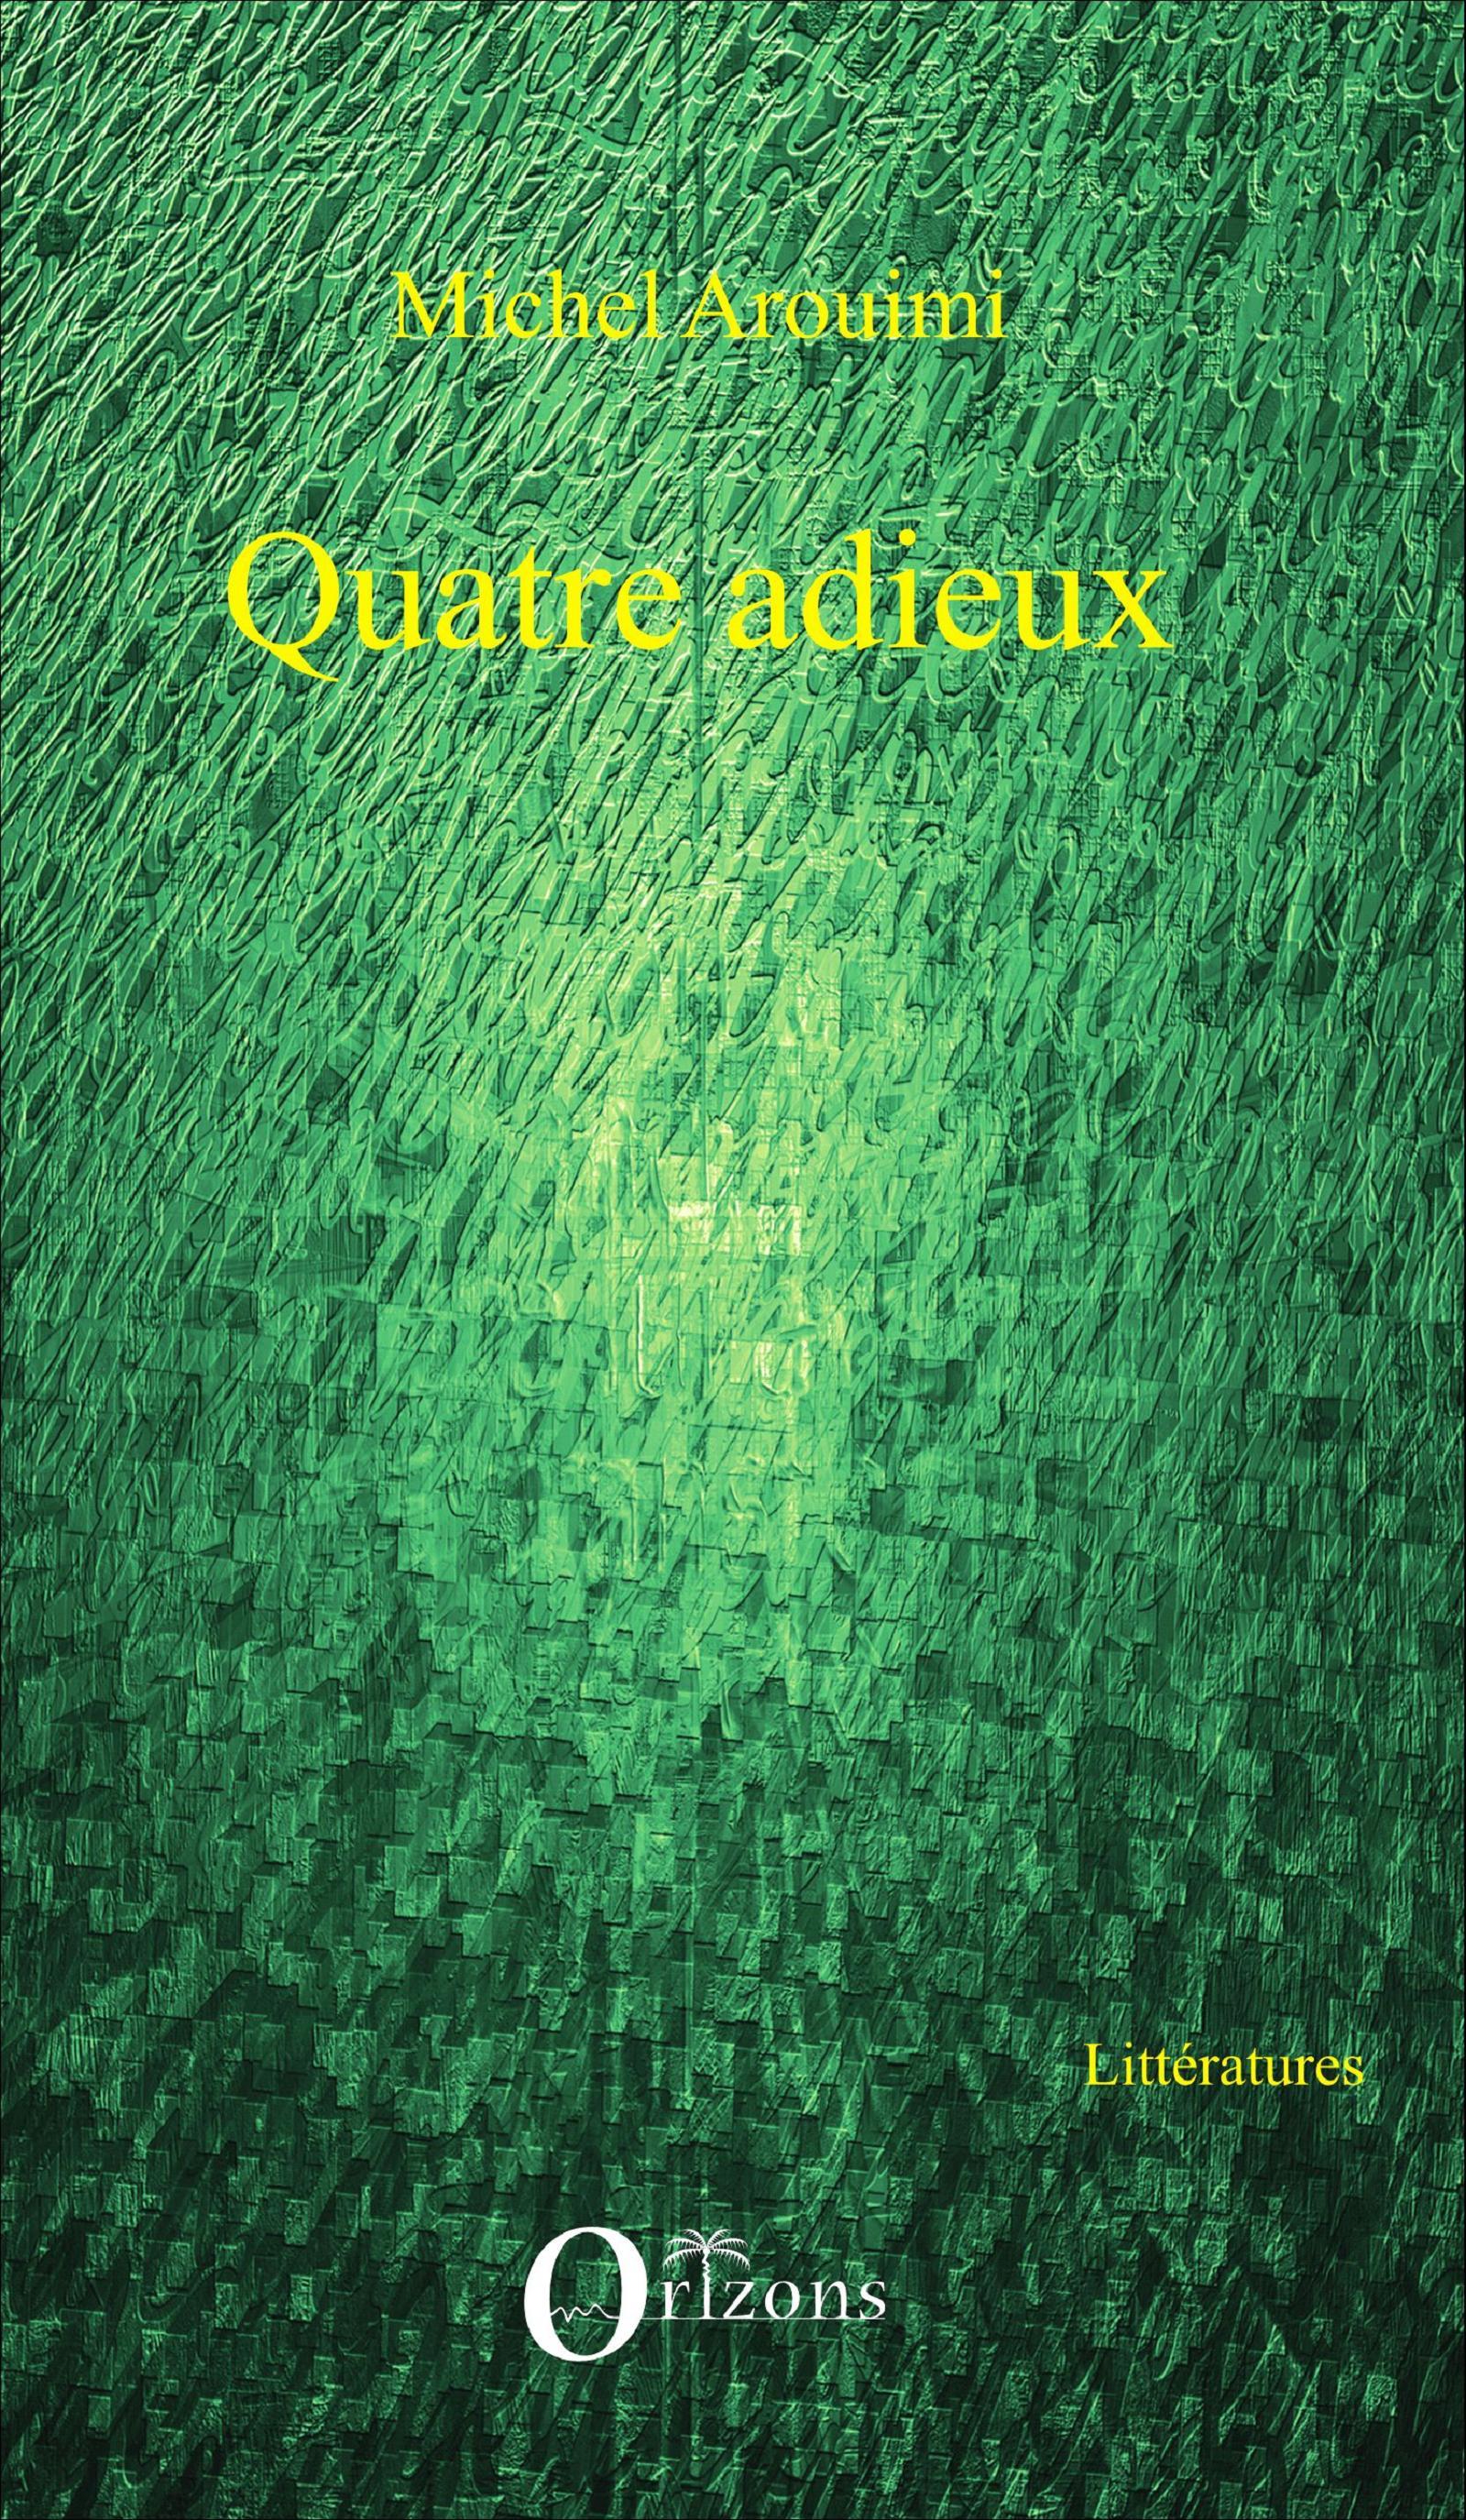 Epub Quatre Arouimi Livre Adieux Ebook Michel wXXqv08